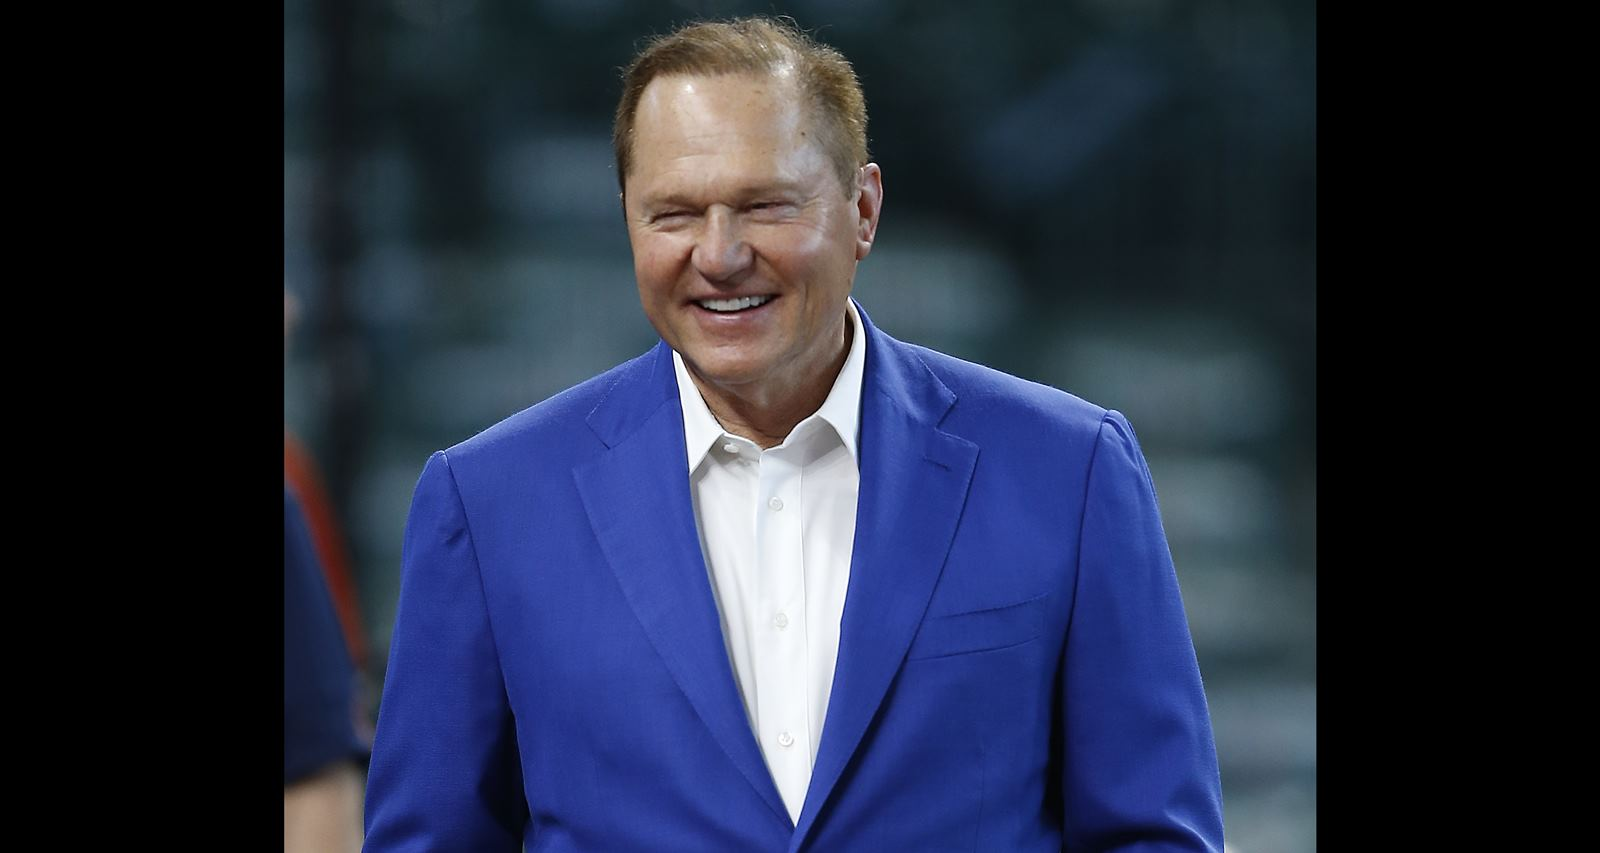 Scott Boras Net Worth 2019: How Rich Is Baseball's Super Agent?